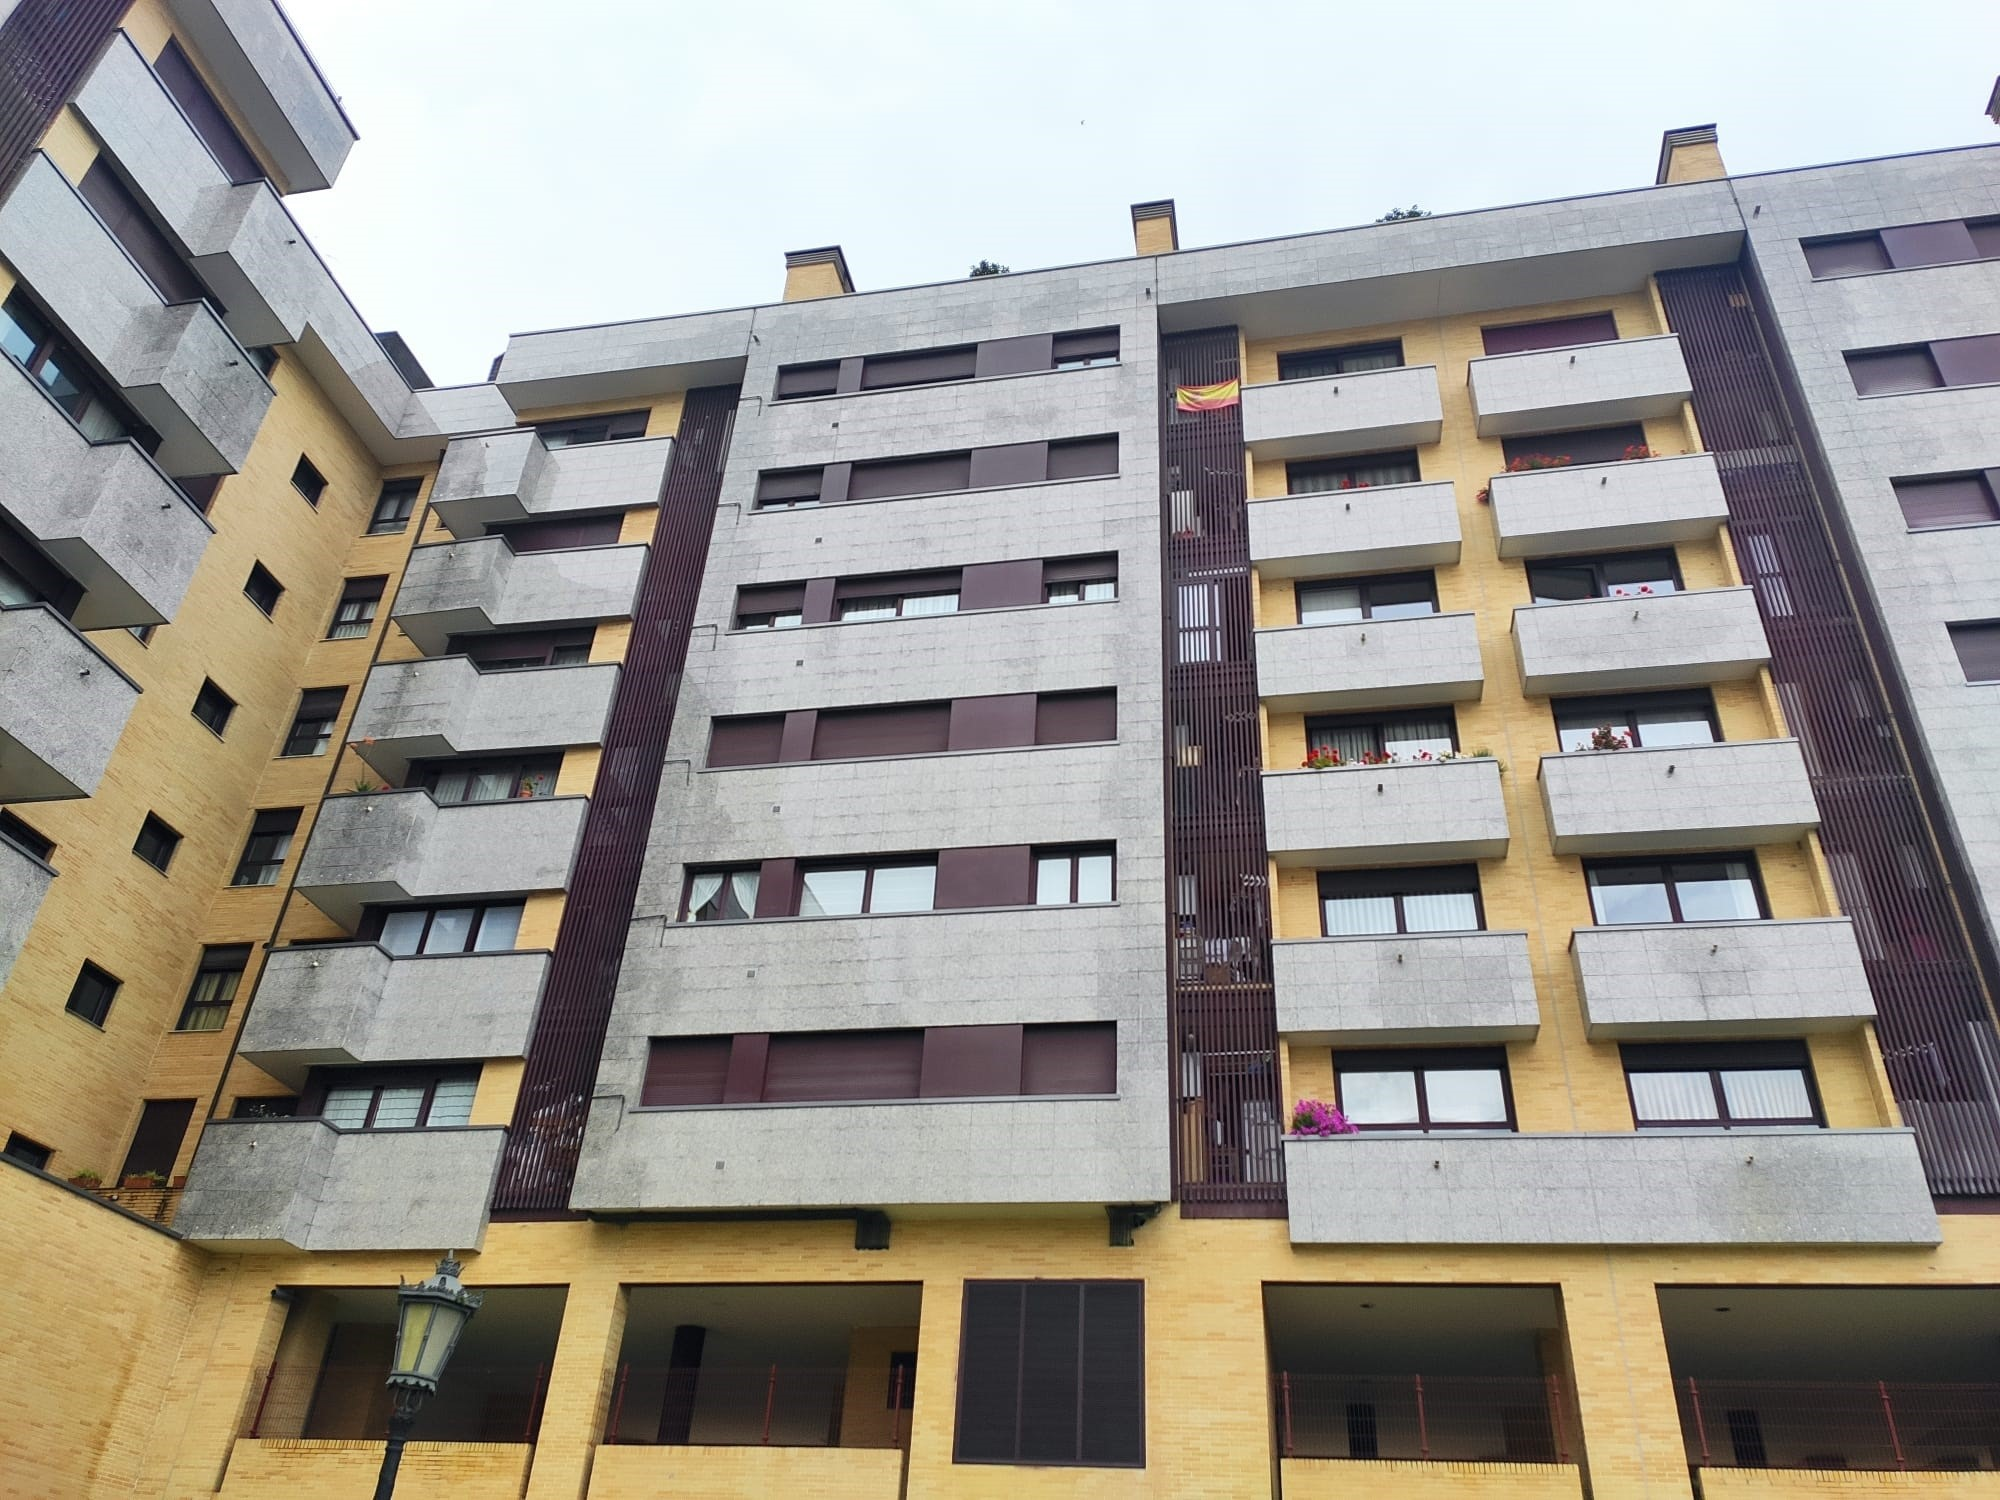 Edificio de viviendas en Oviedo / Europa Press